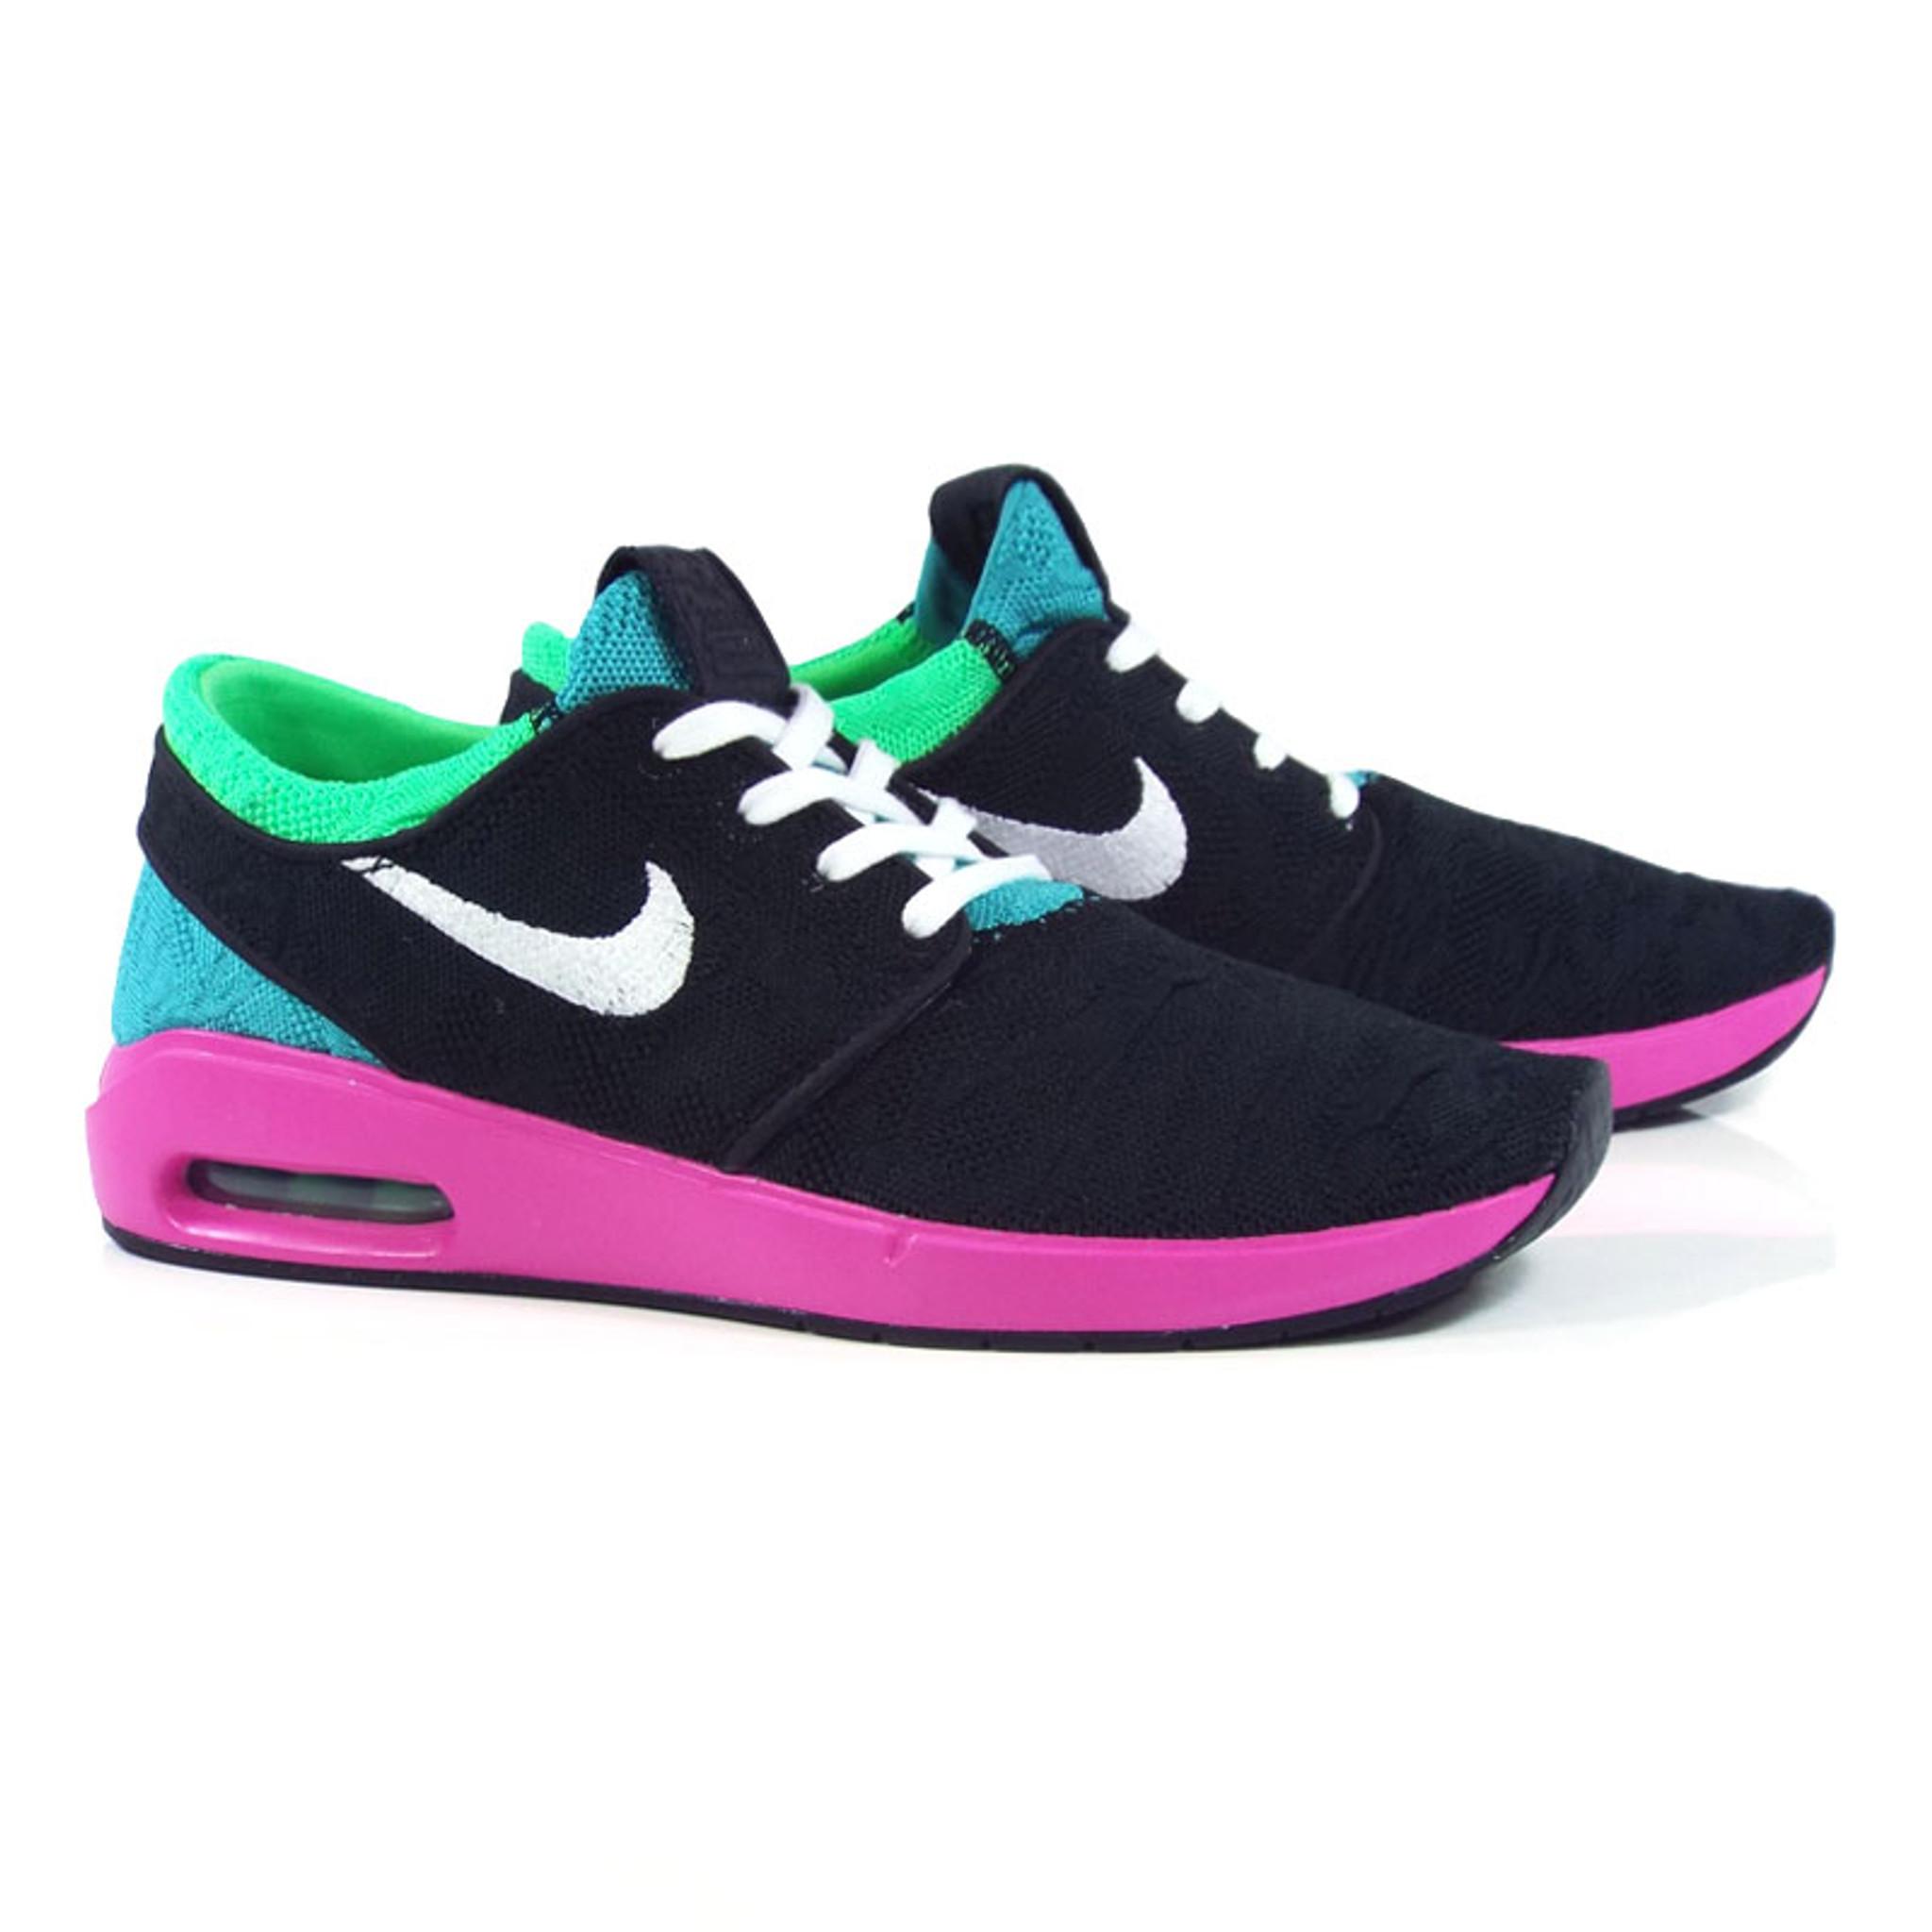 Nike SB Janoski Air Max 2 Shoes BlackWhite Cabana Electro Green